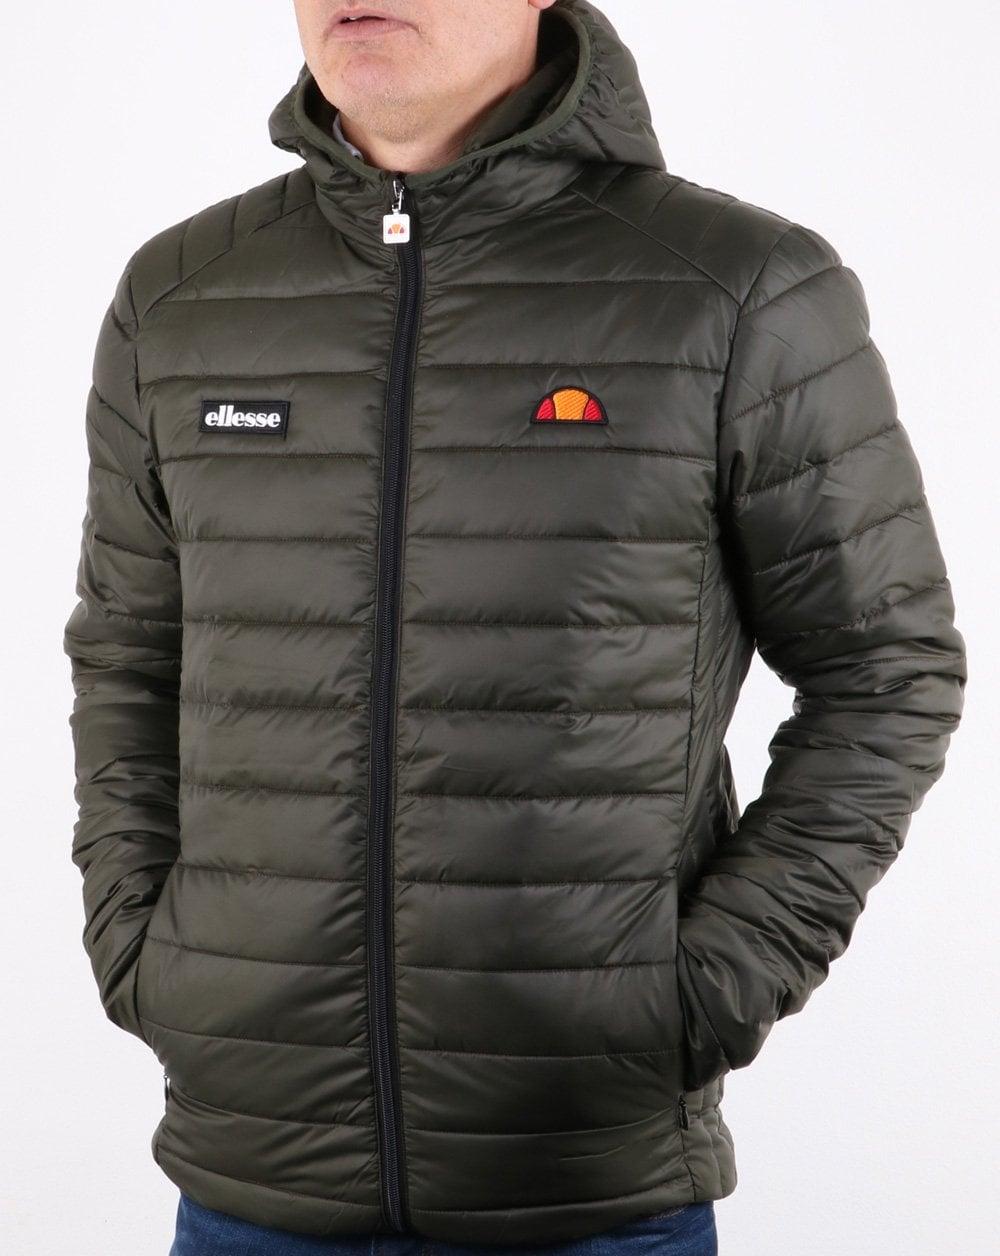 098fe70335 Ellesse Lombardy Jacket, Khaki, Green, Padded, Bubble,puffer,coat,mens